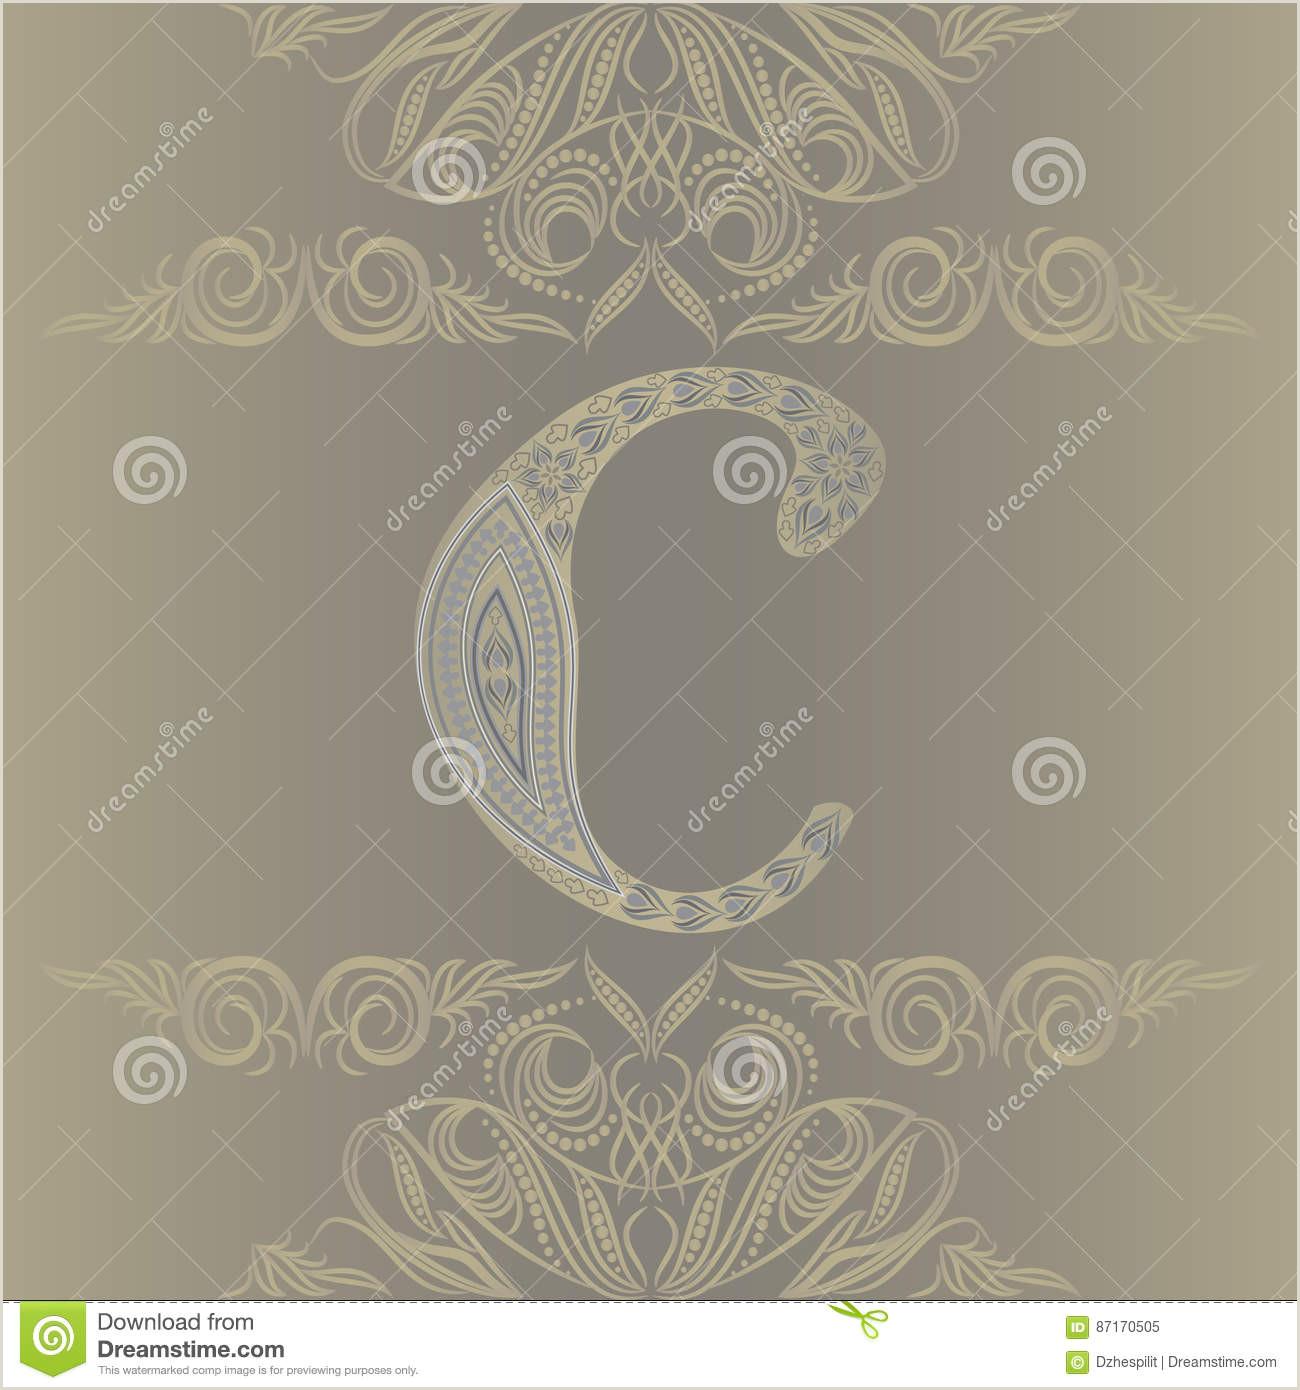 Personal Cards Designs Business Card Monogram Emblem Letter C Template Design